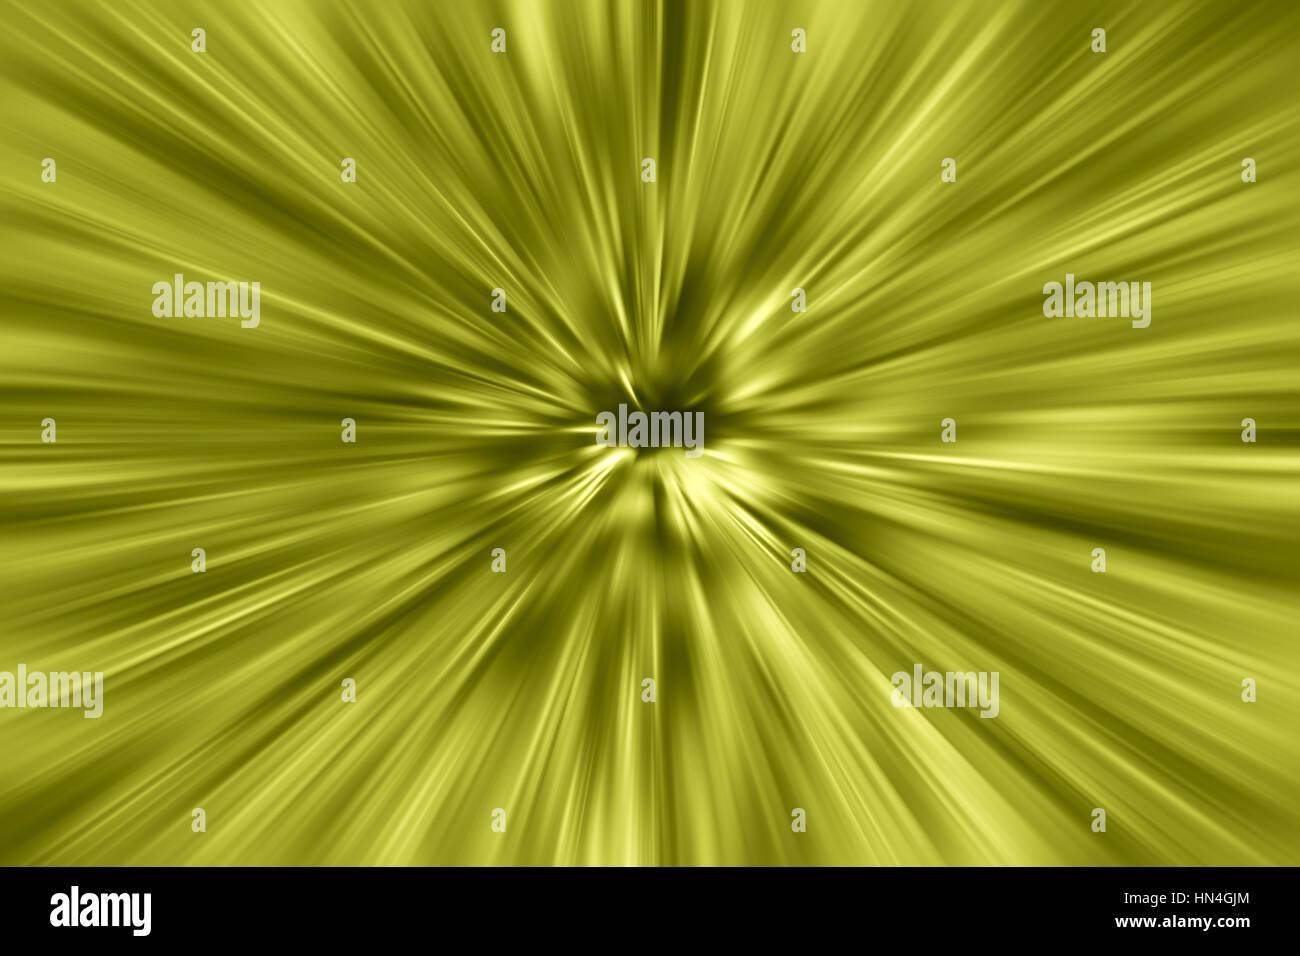 Acceleration super fast speed motion zoom blur background for design. - Stock Image